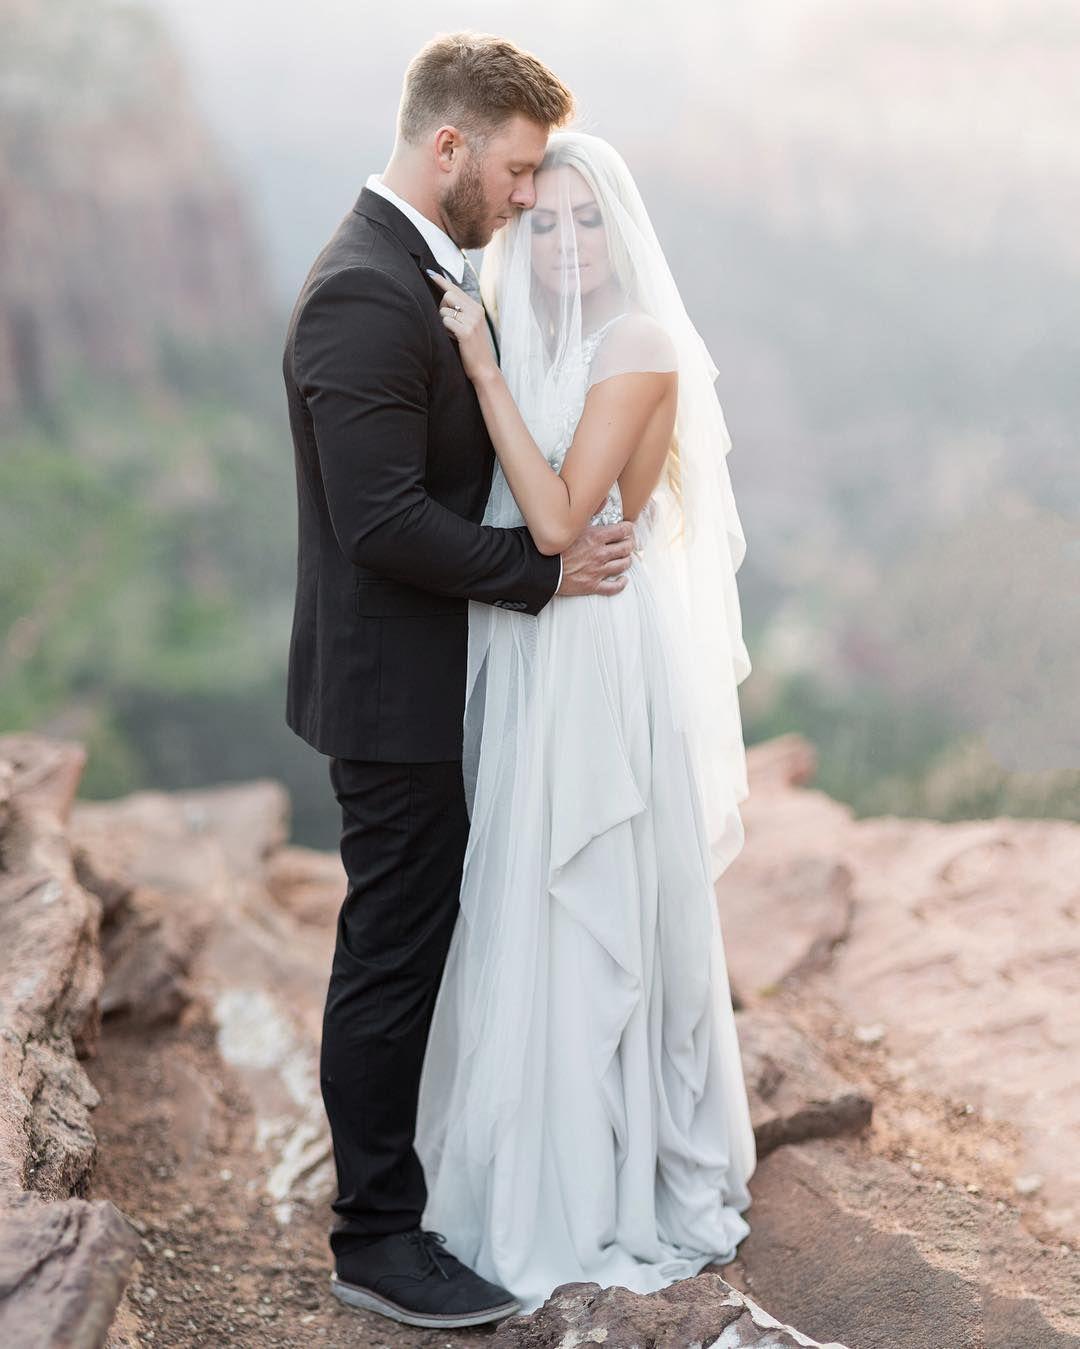 Wedding photographer next workshop nov dearly beloved